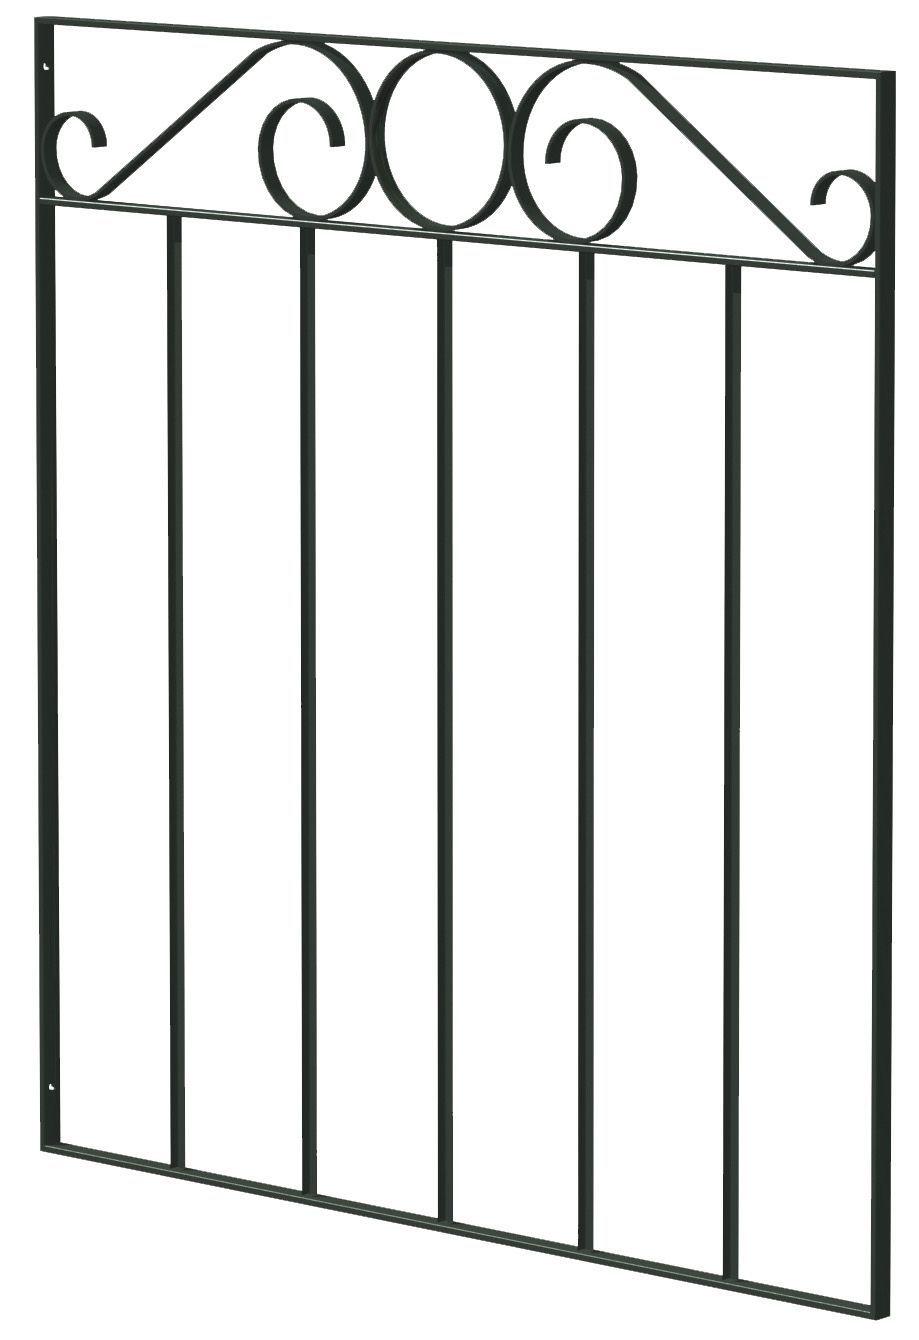 Blooma Steel Swirl Top Narrow Gate H 850mm W 770mm Rooms Diy